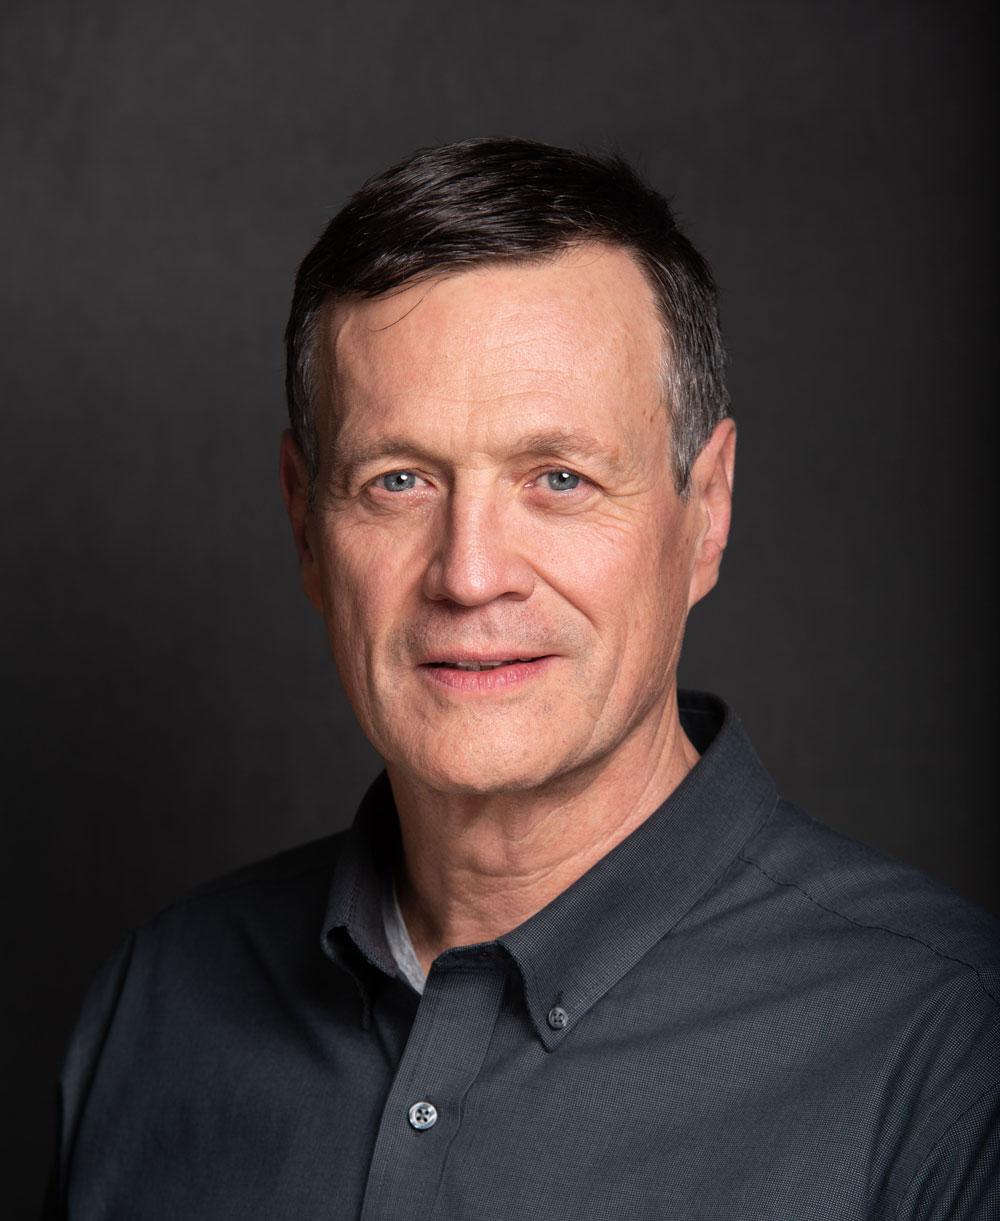 Headshot of Smart Plastic's Vice President, Jay Tapp.